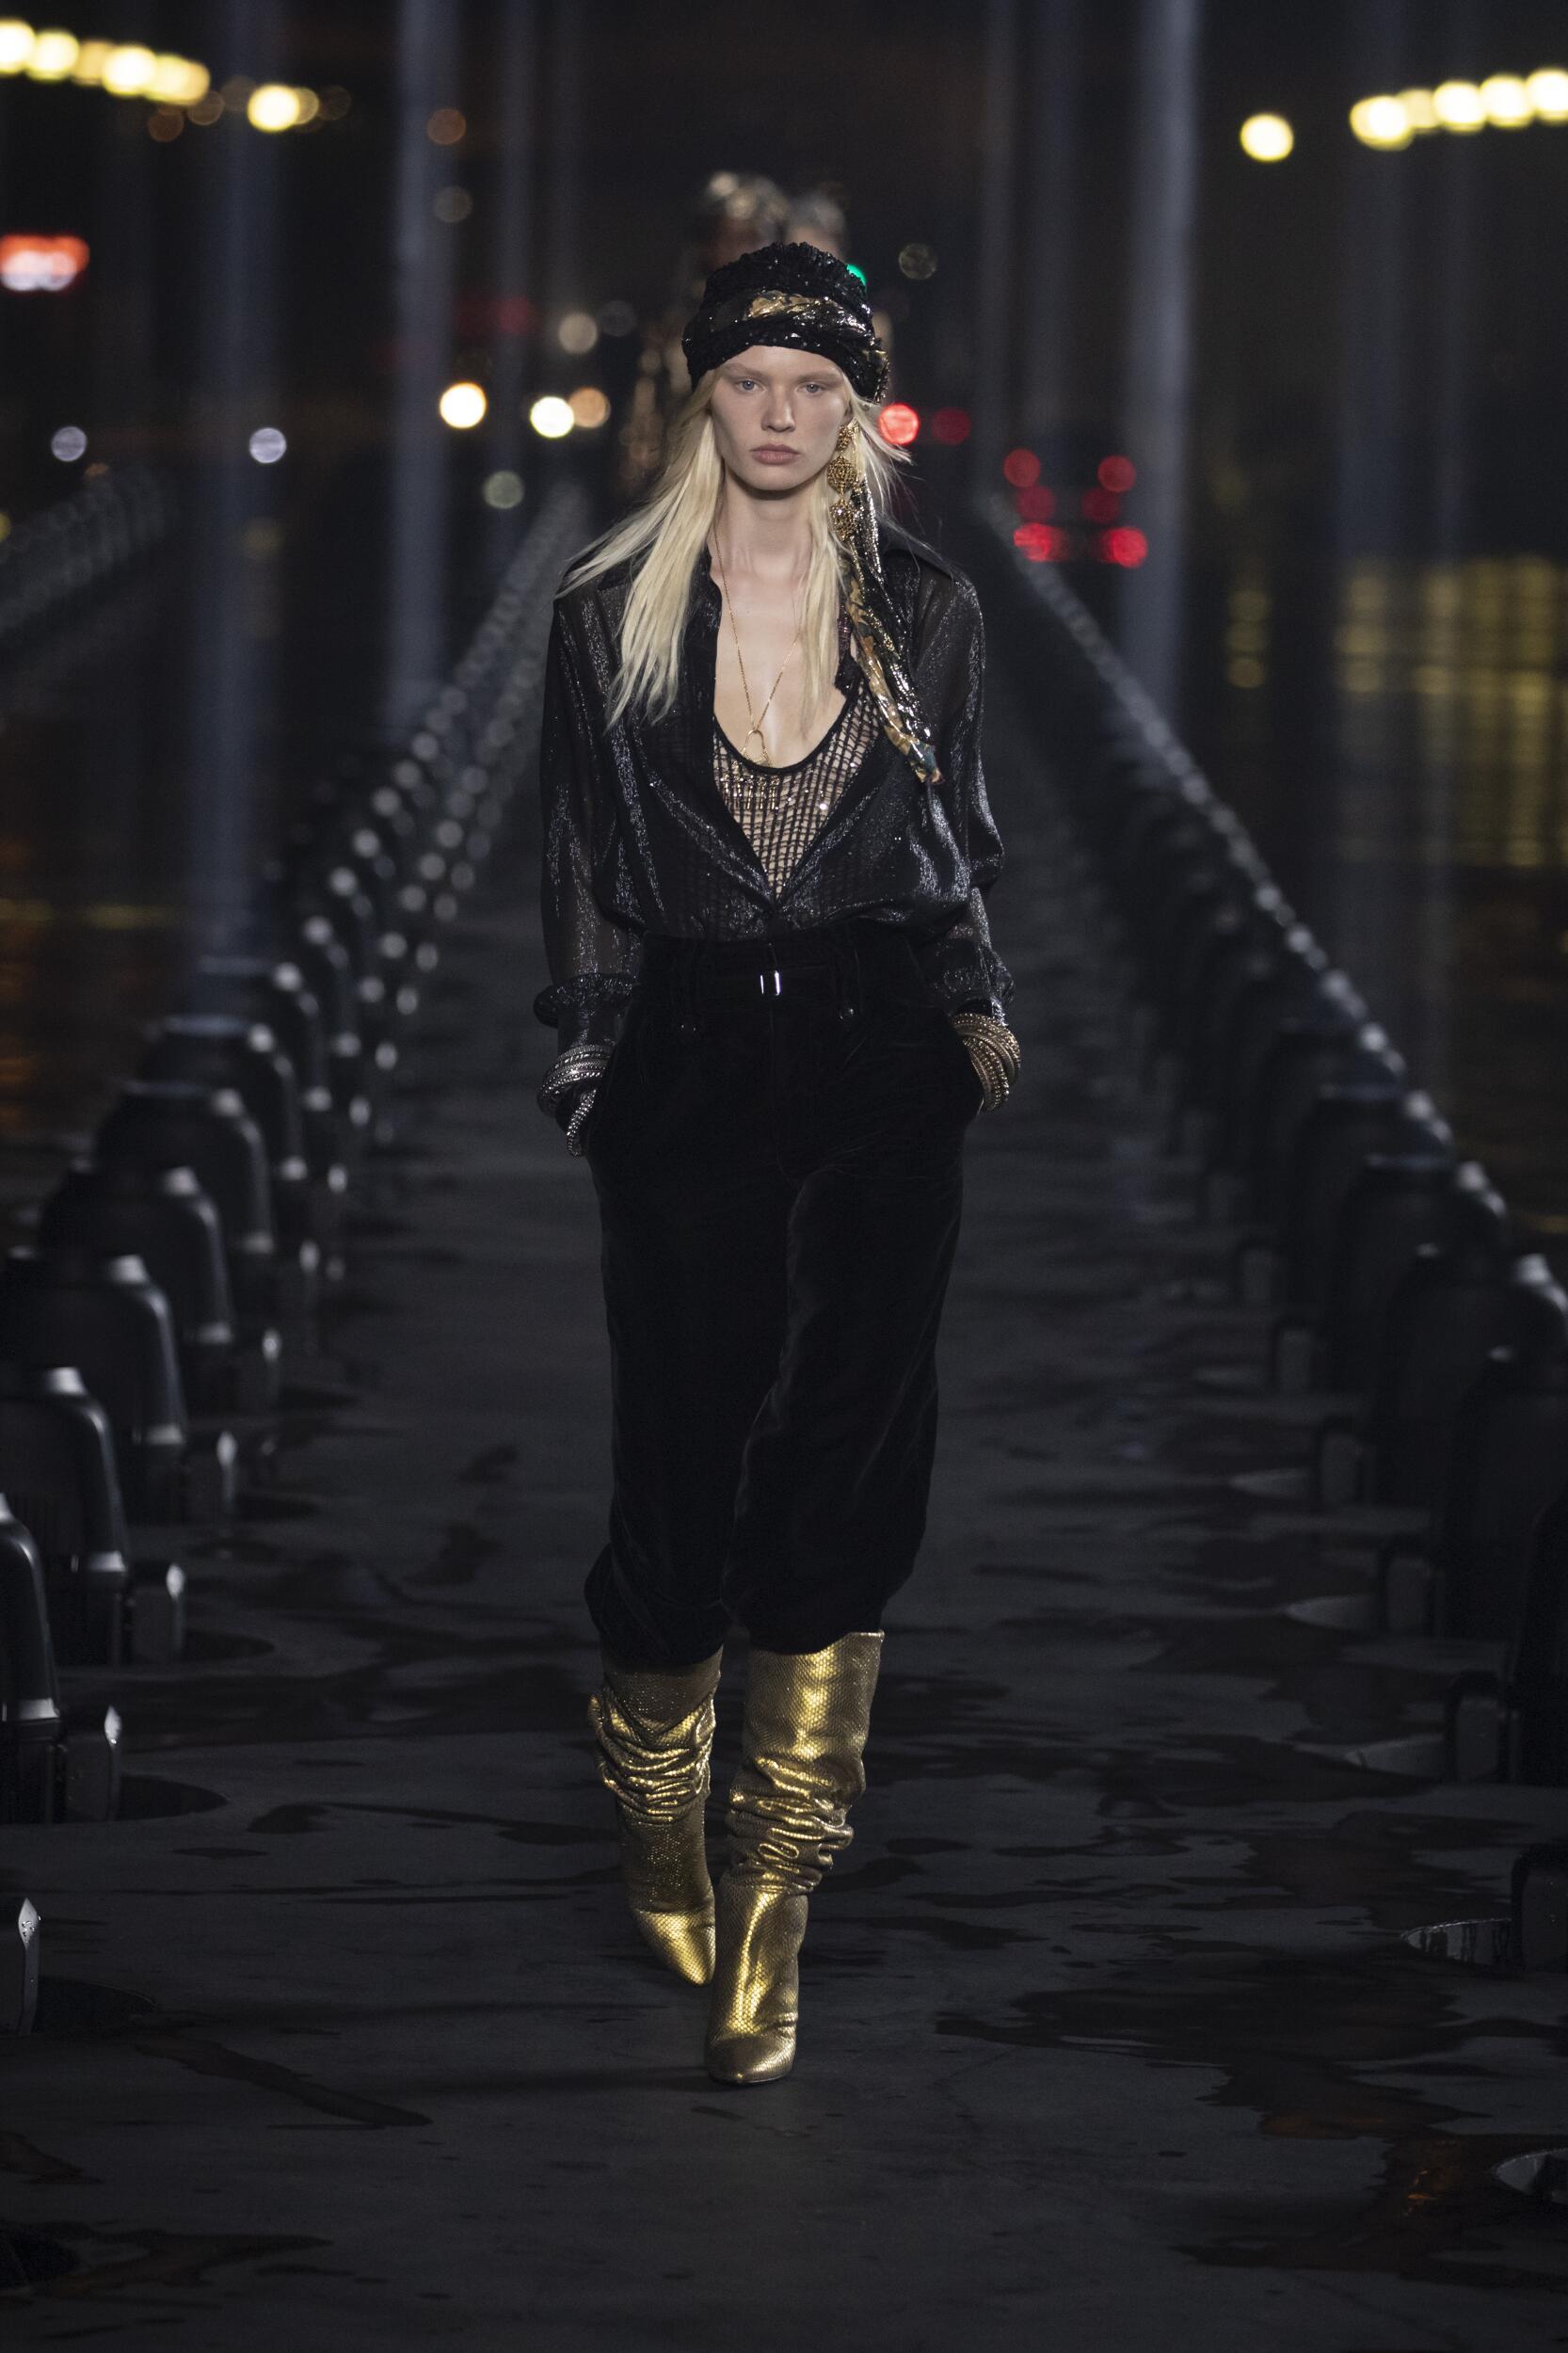 Runway Saint Laurent Spring Summer 2020 Women's Collection Paris Fashion Week